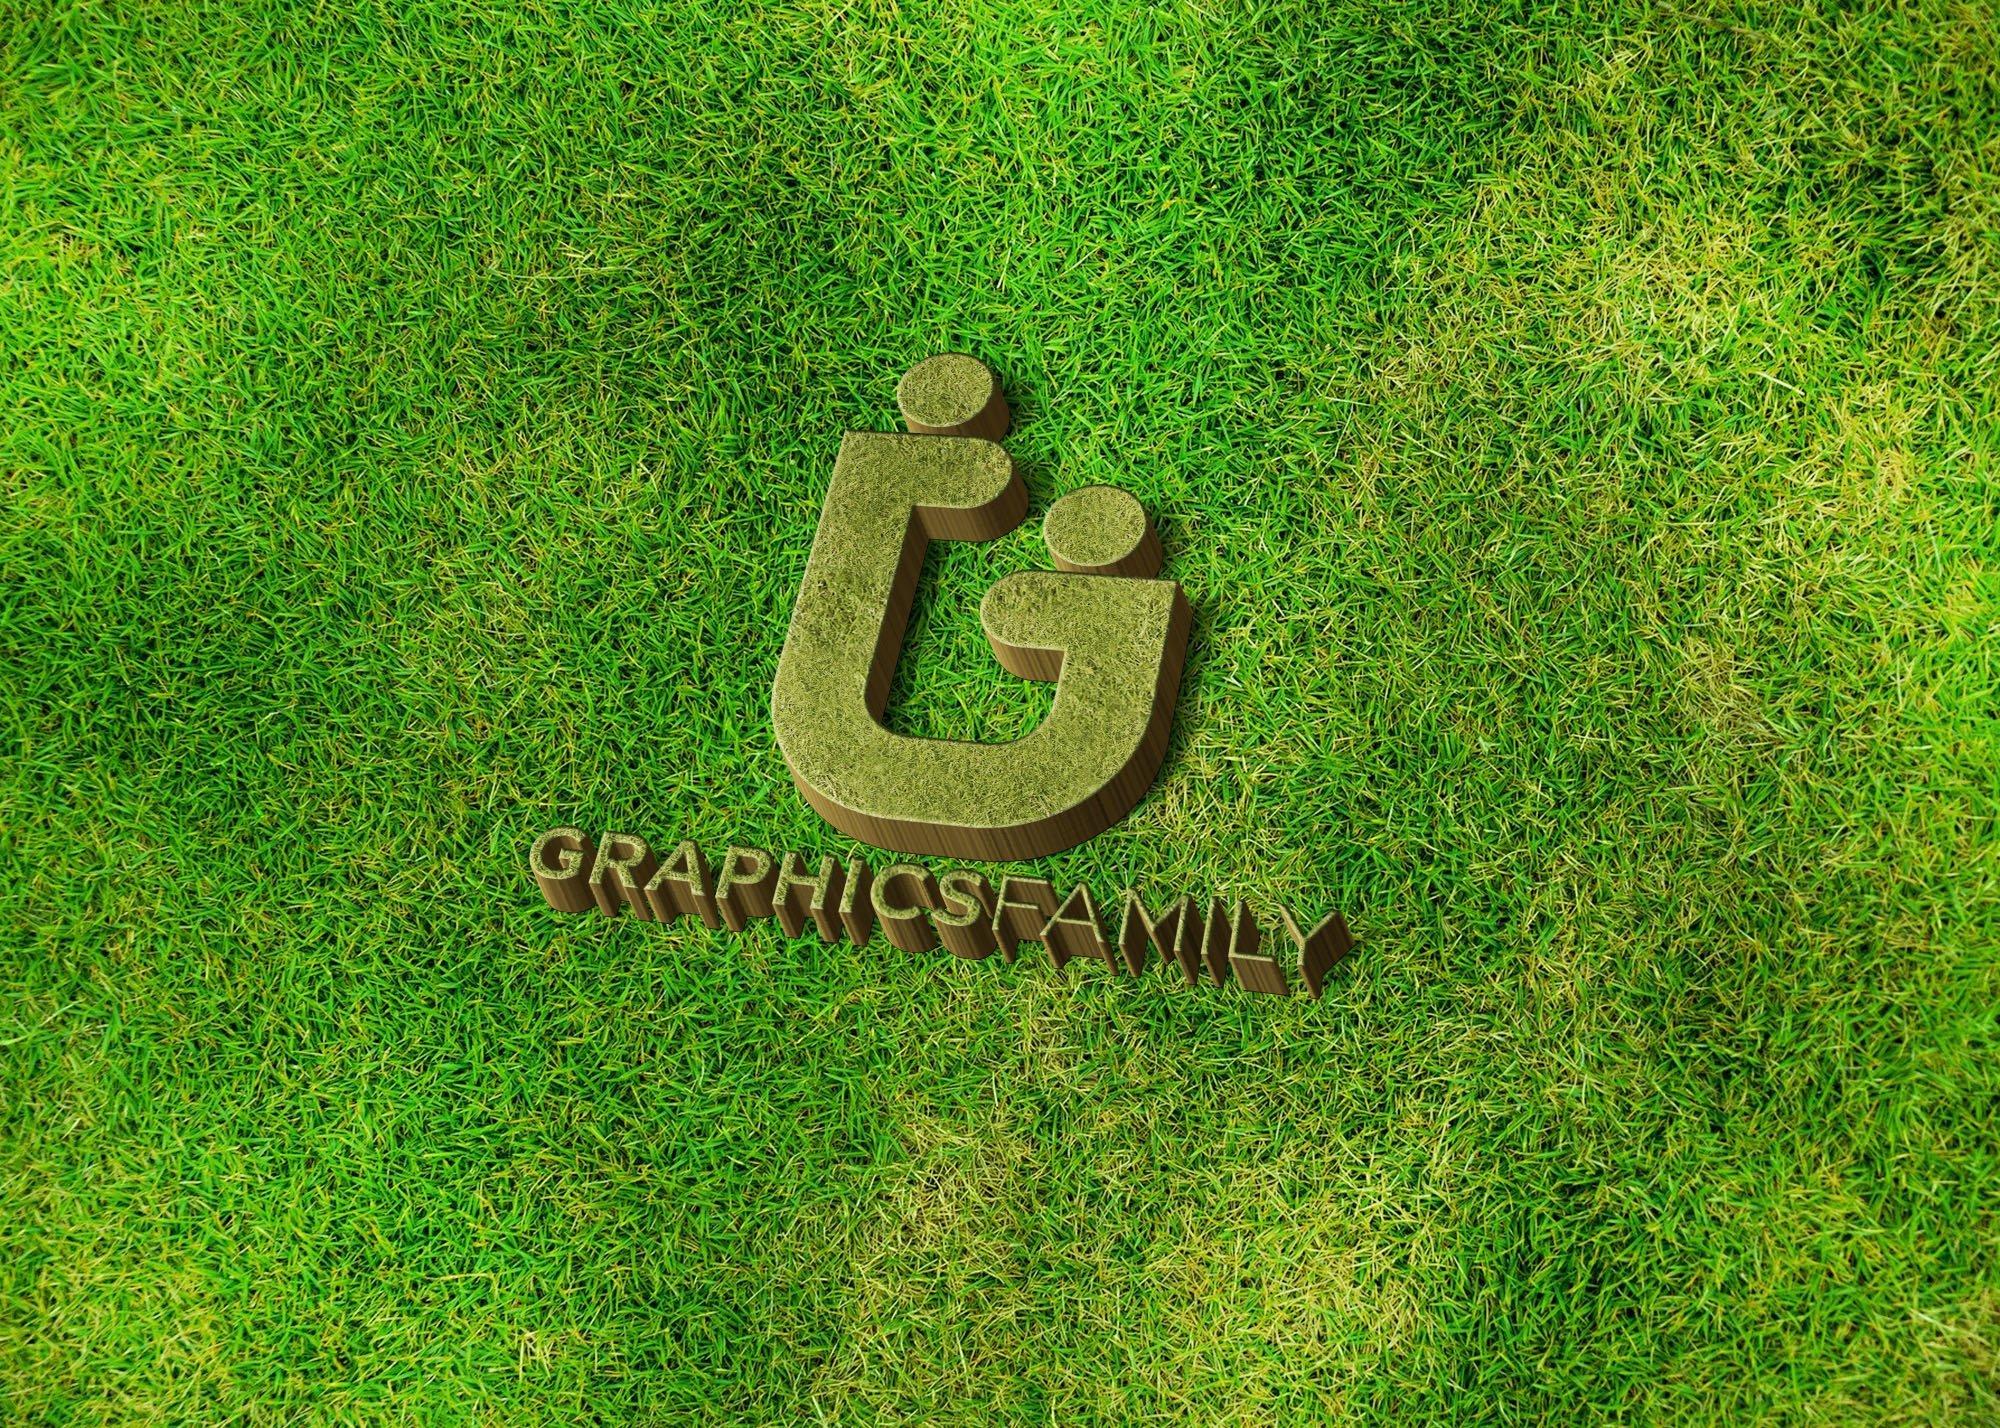 Graphics family logo on 3d grass mockup